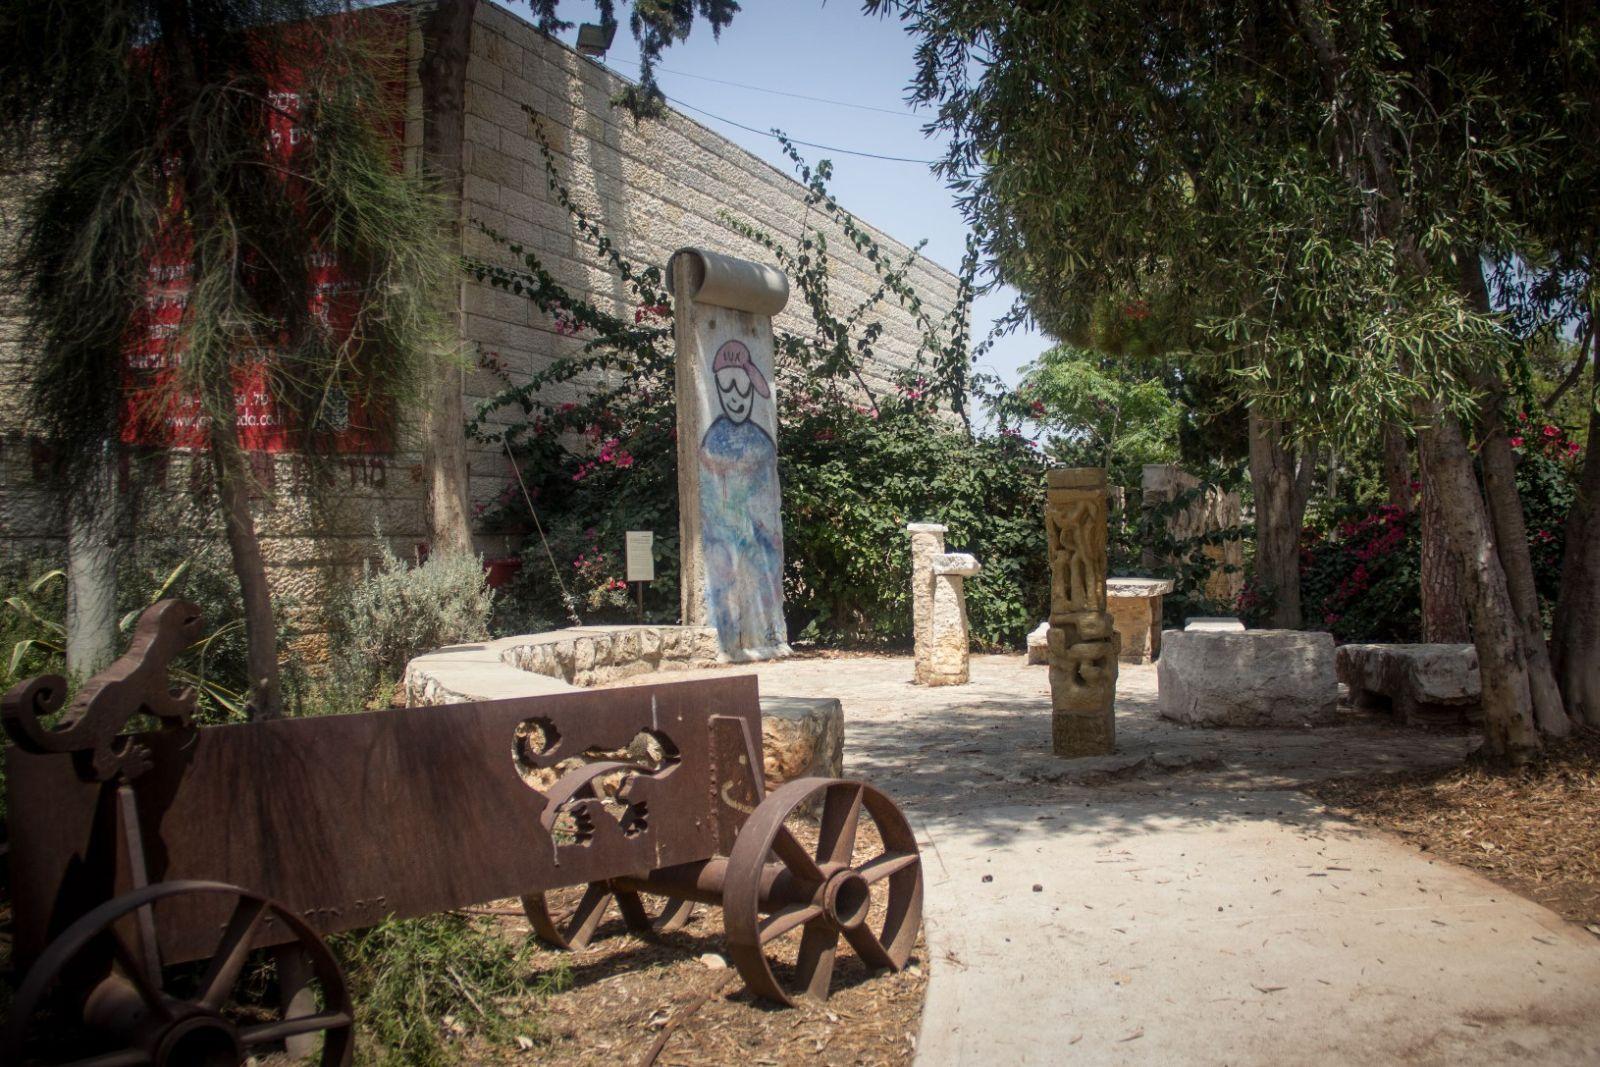 There are visual surprises around every corner in Ein Hod. Photo by Garrett Mills/FLASH90